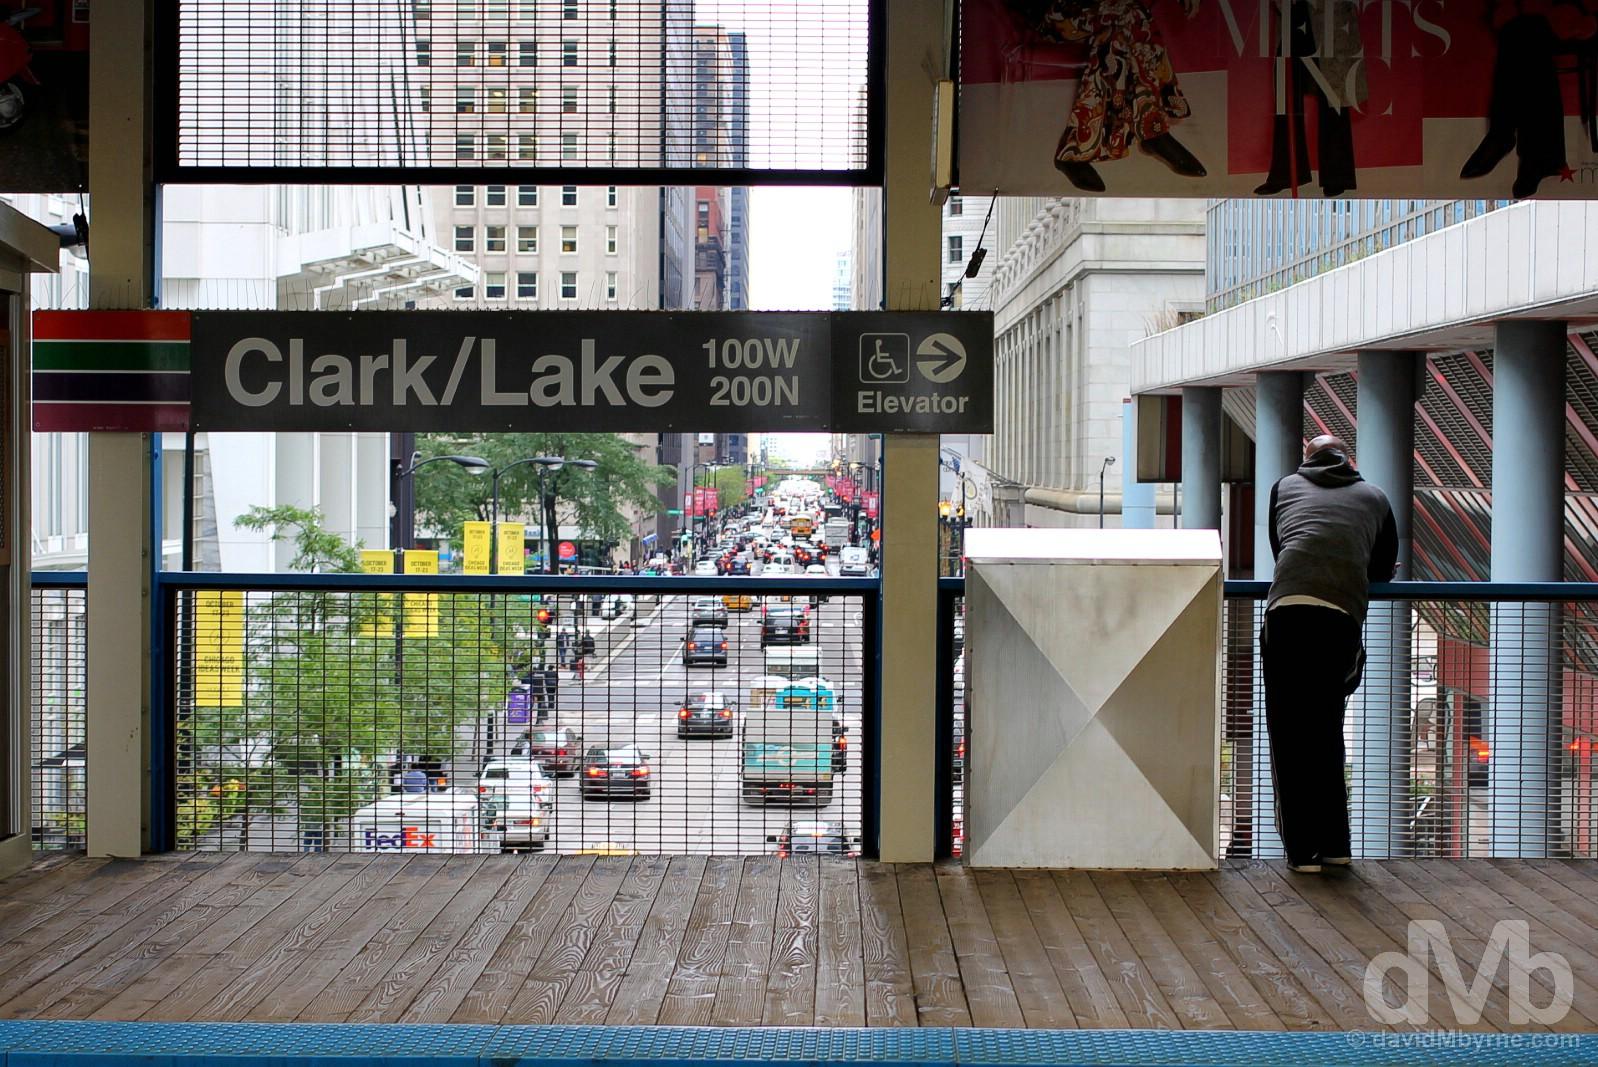 Clark/Lake CTA Station, Downtown, Chicago, Illinois, USA. September 30, 2016.